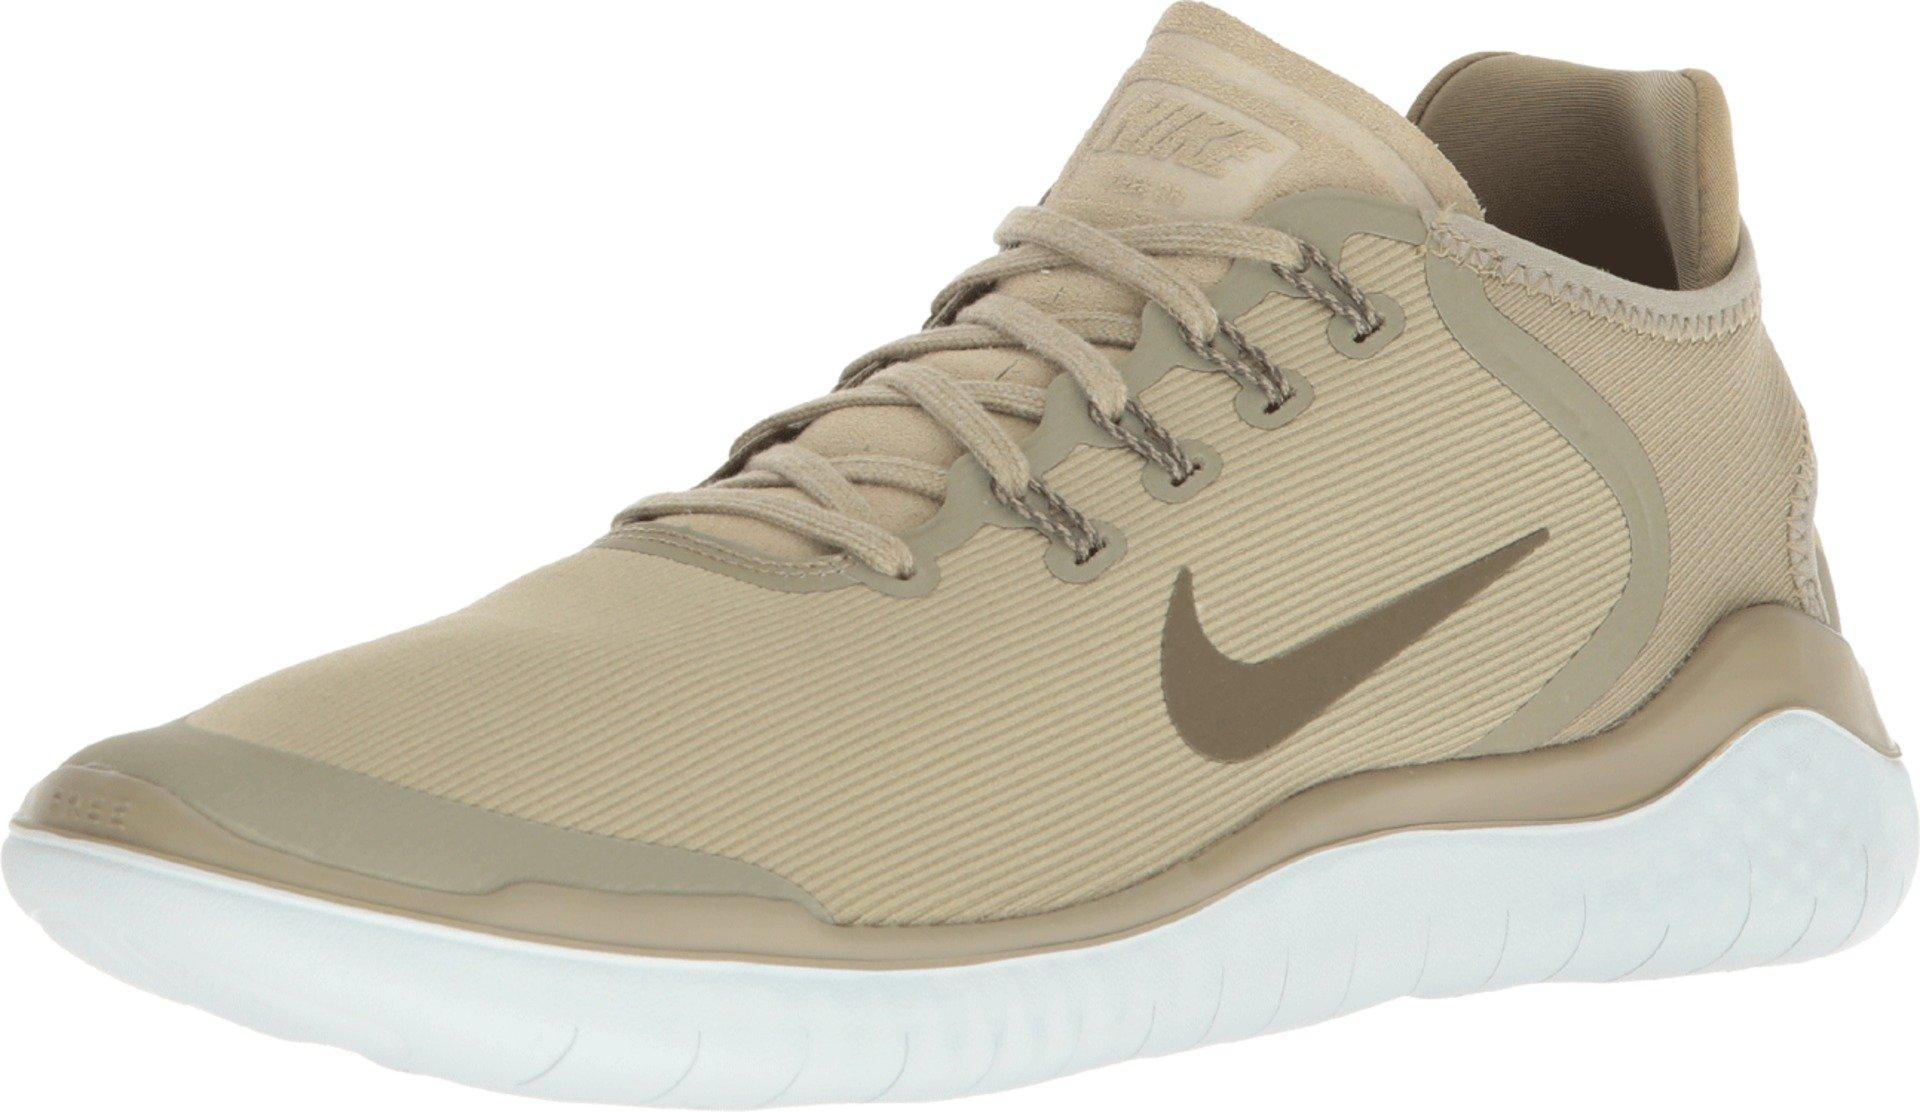 567b0ddb92e13 Galleon - Nike Free RN 2018 Sun Running Shoe (8.5 D(M) US